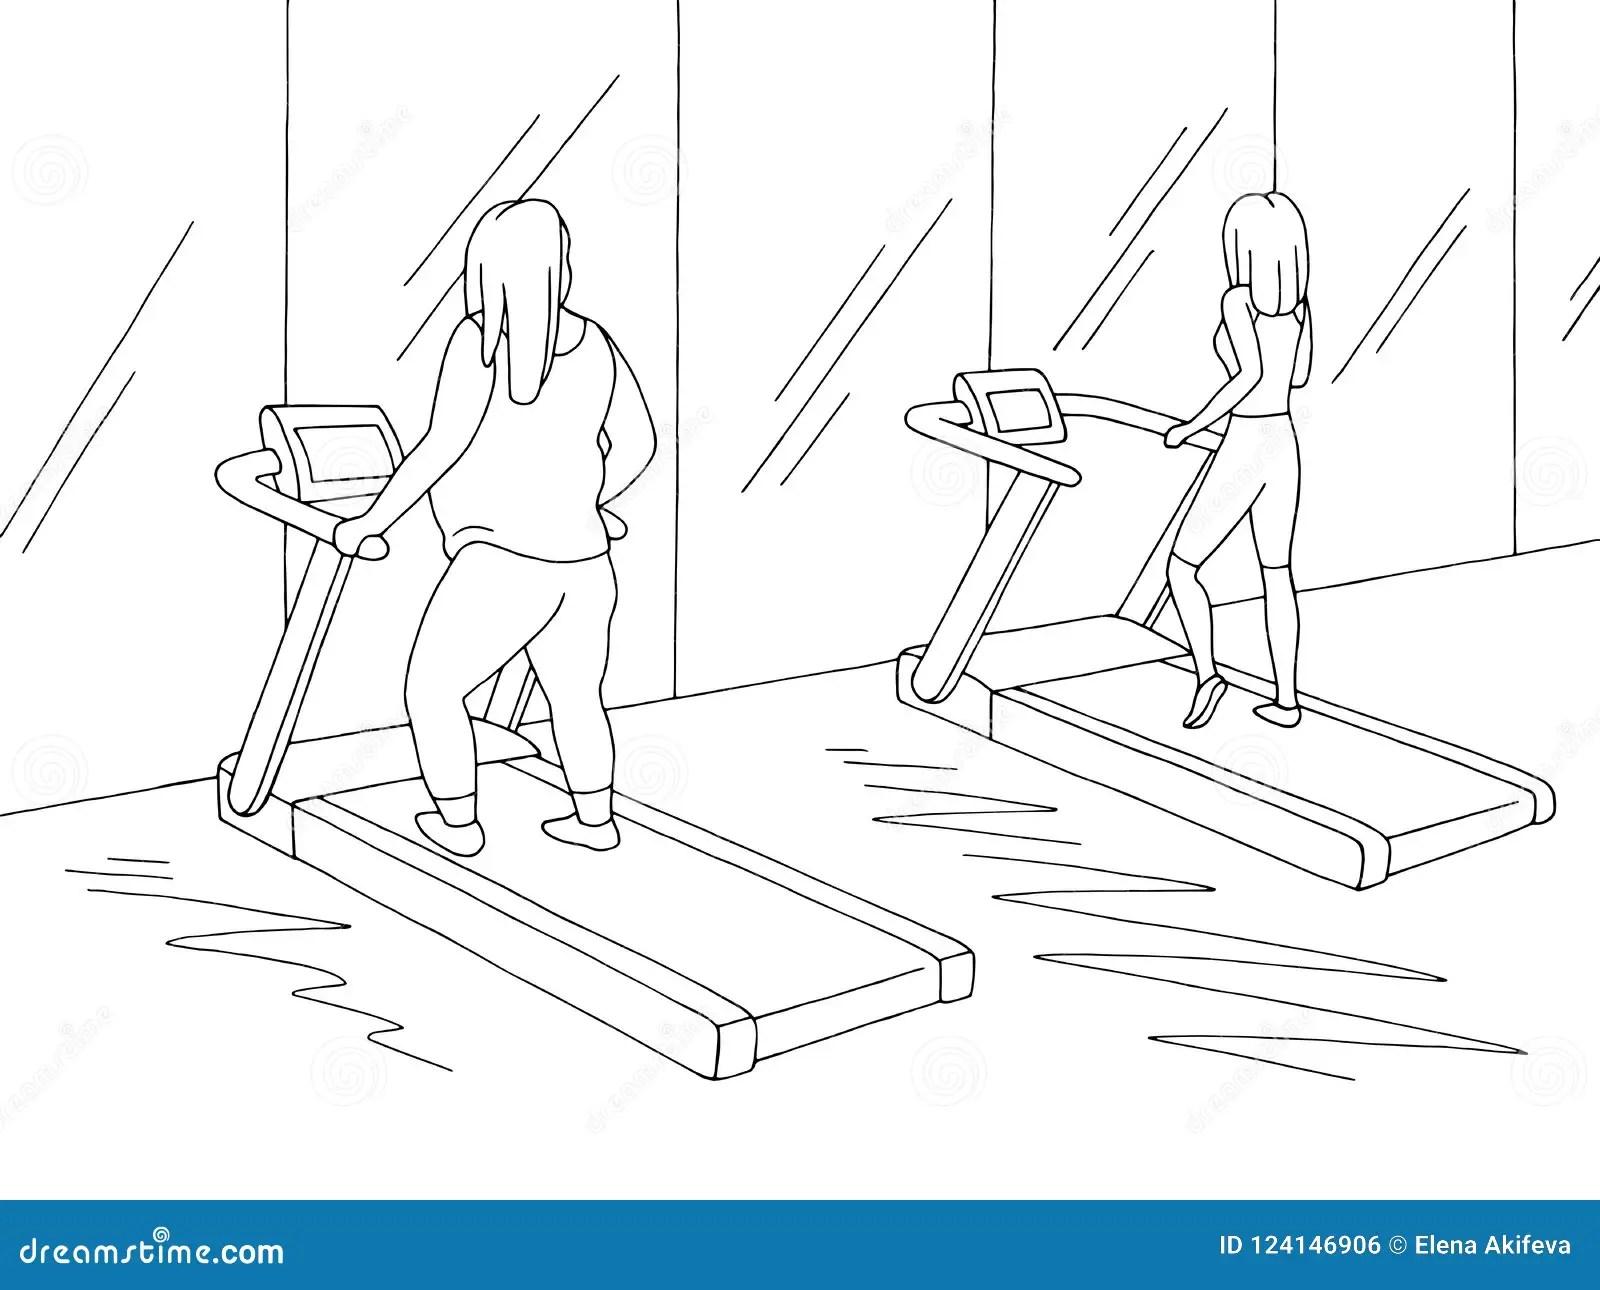 Gym Interior Graphic Black White Sketch Illustration